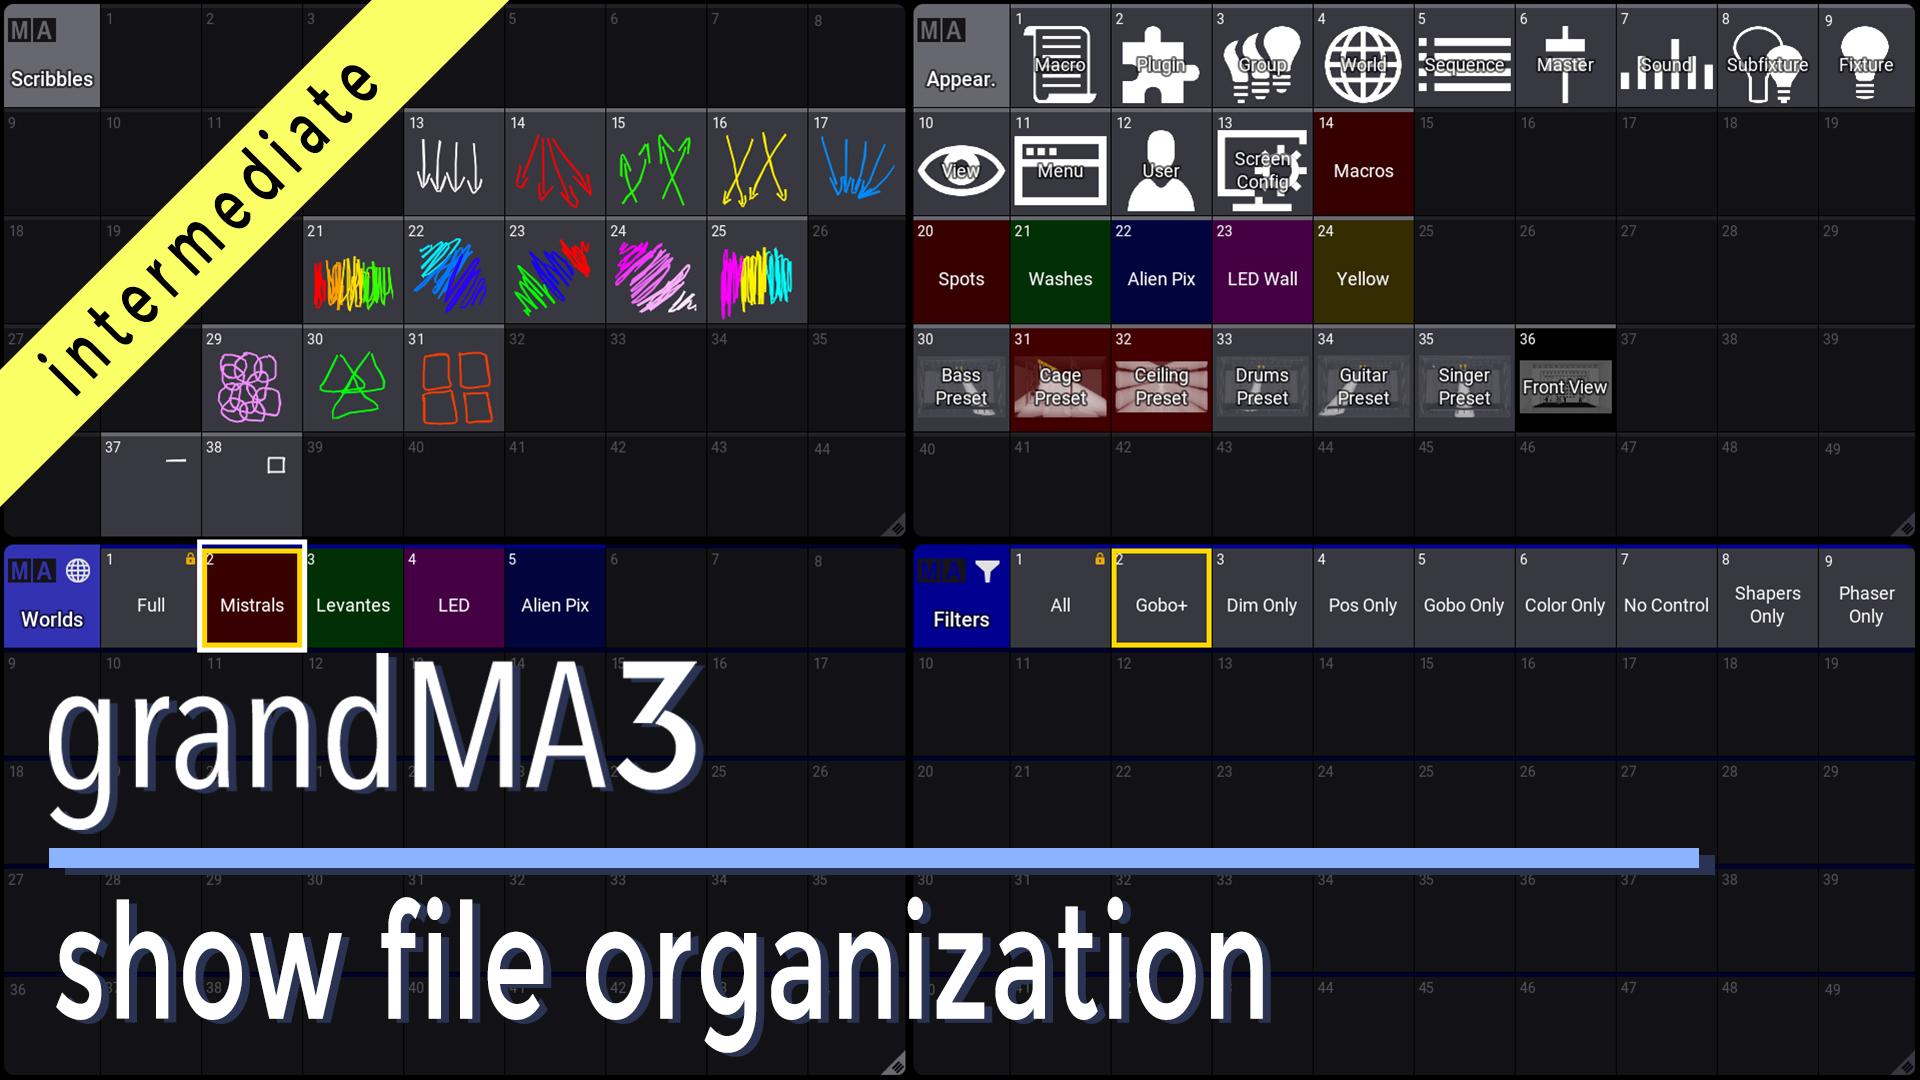 grandMA3 Show File Organization